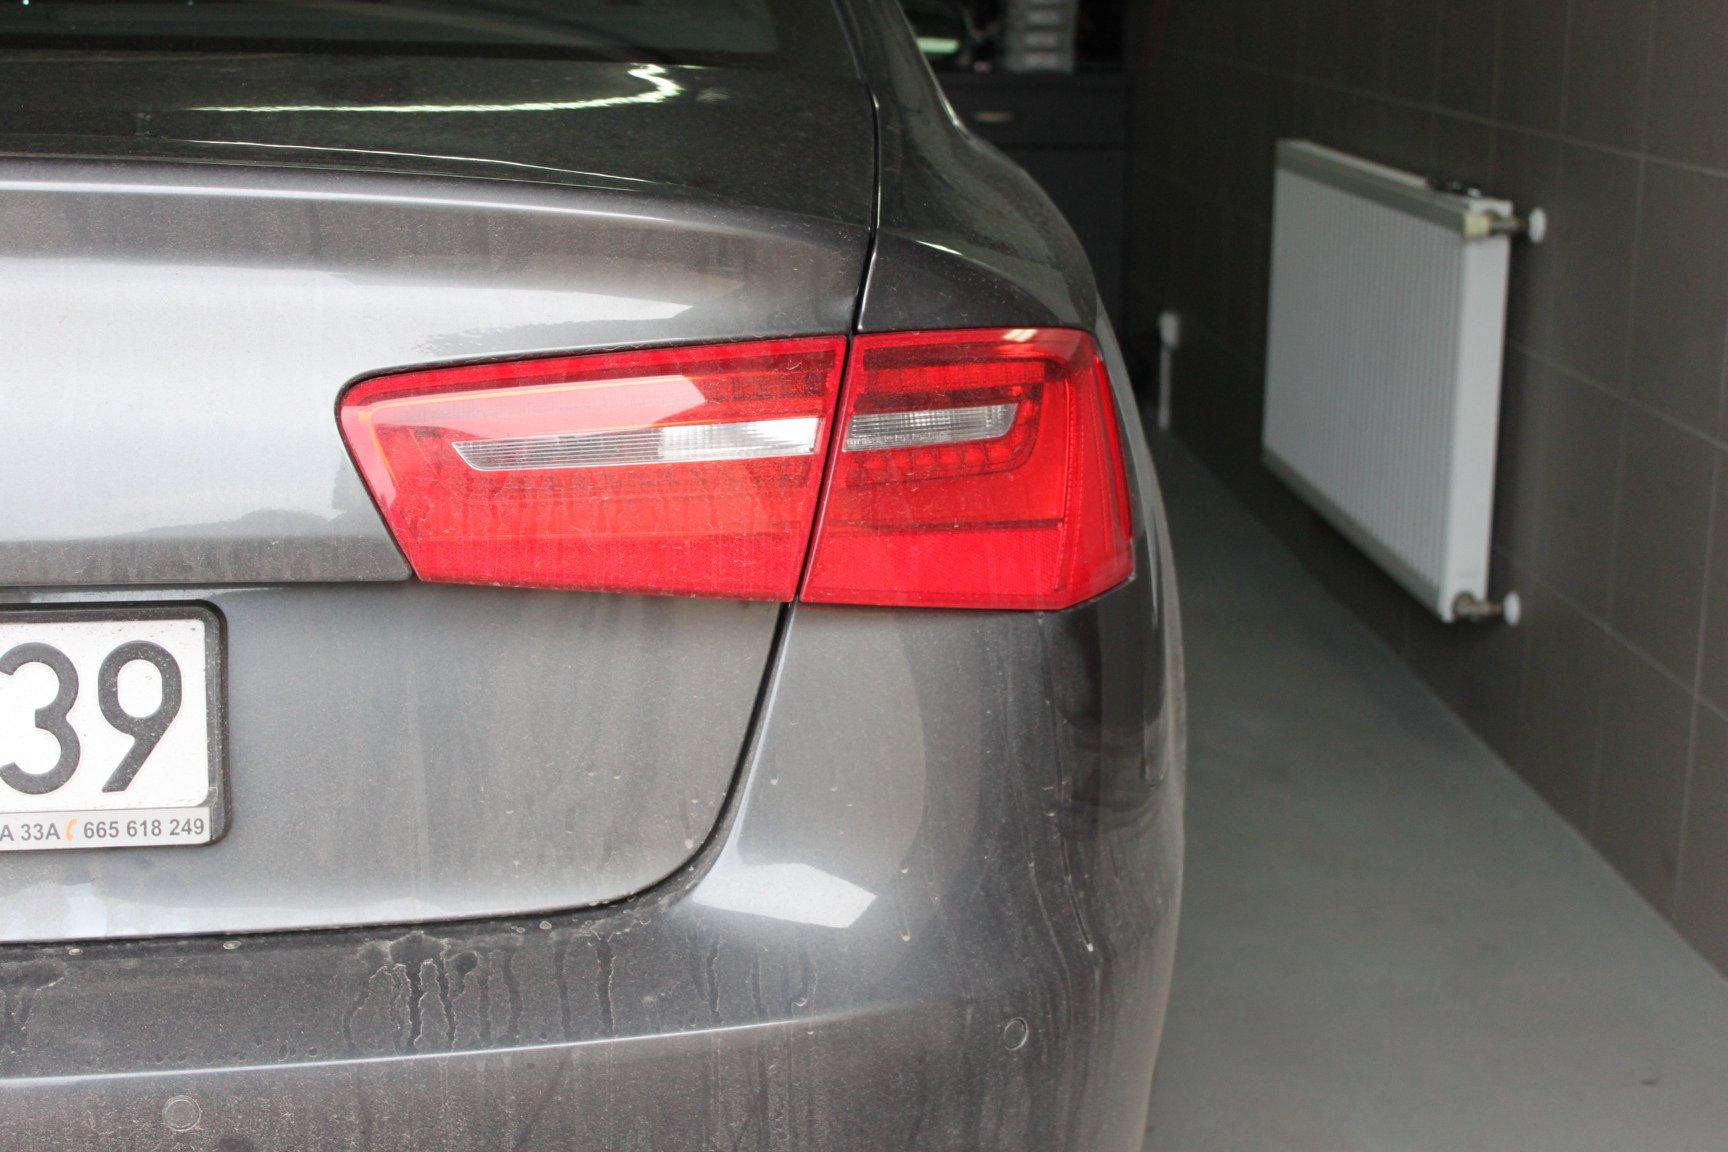 AUDI A6 C7 2013 3.0 TFSI QUATTRO